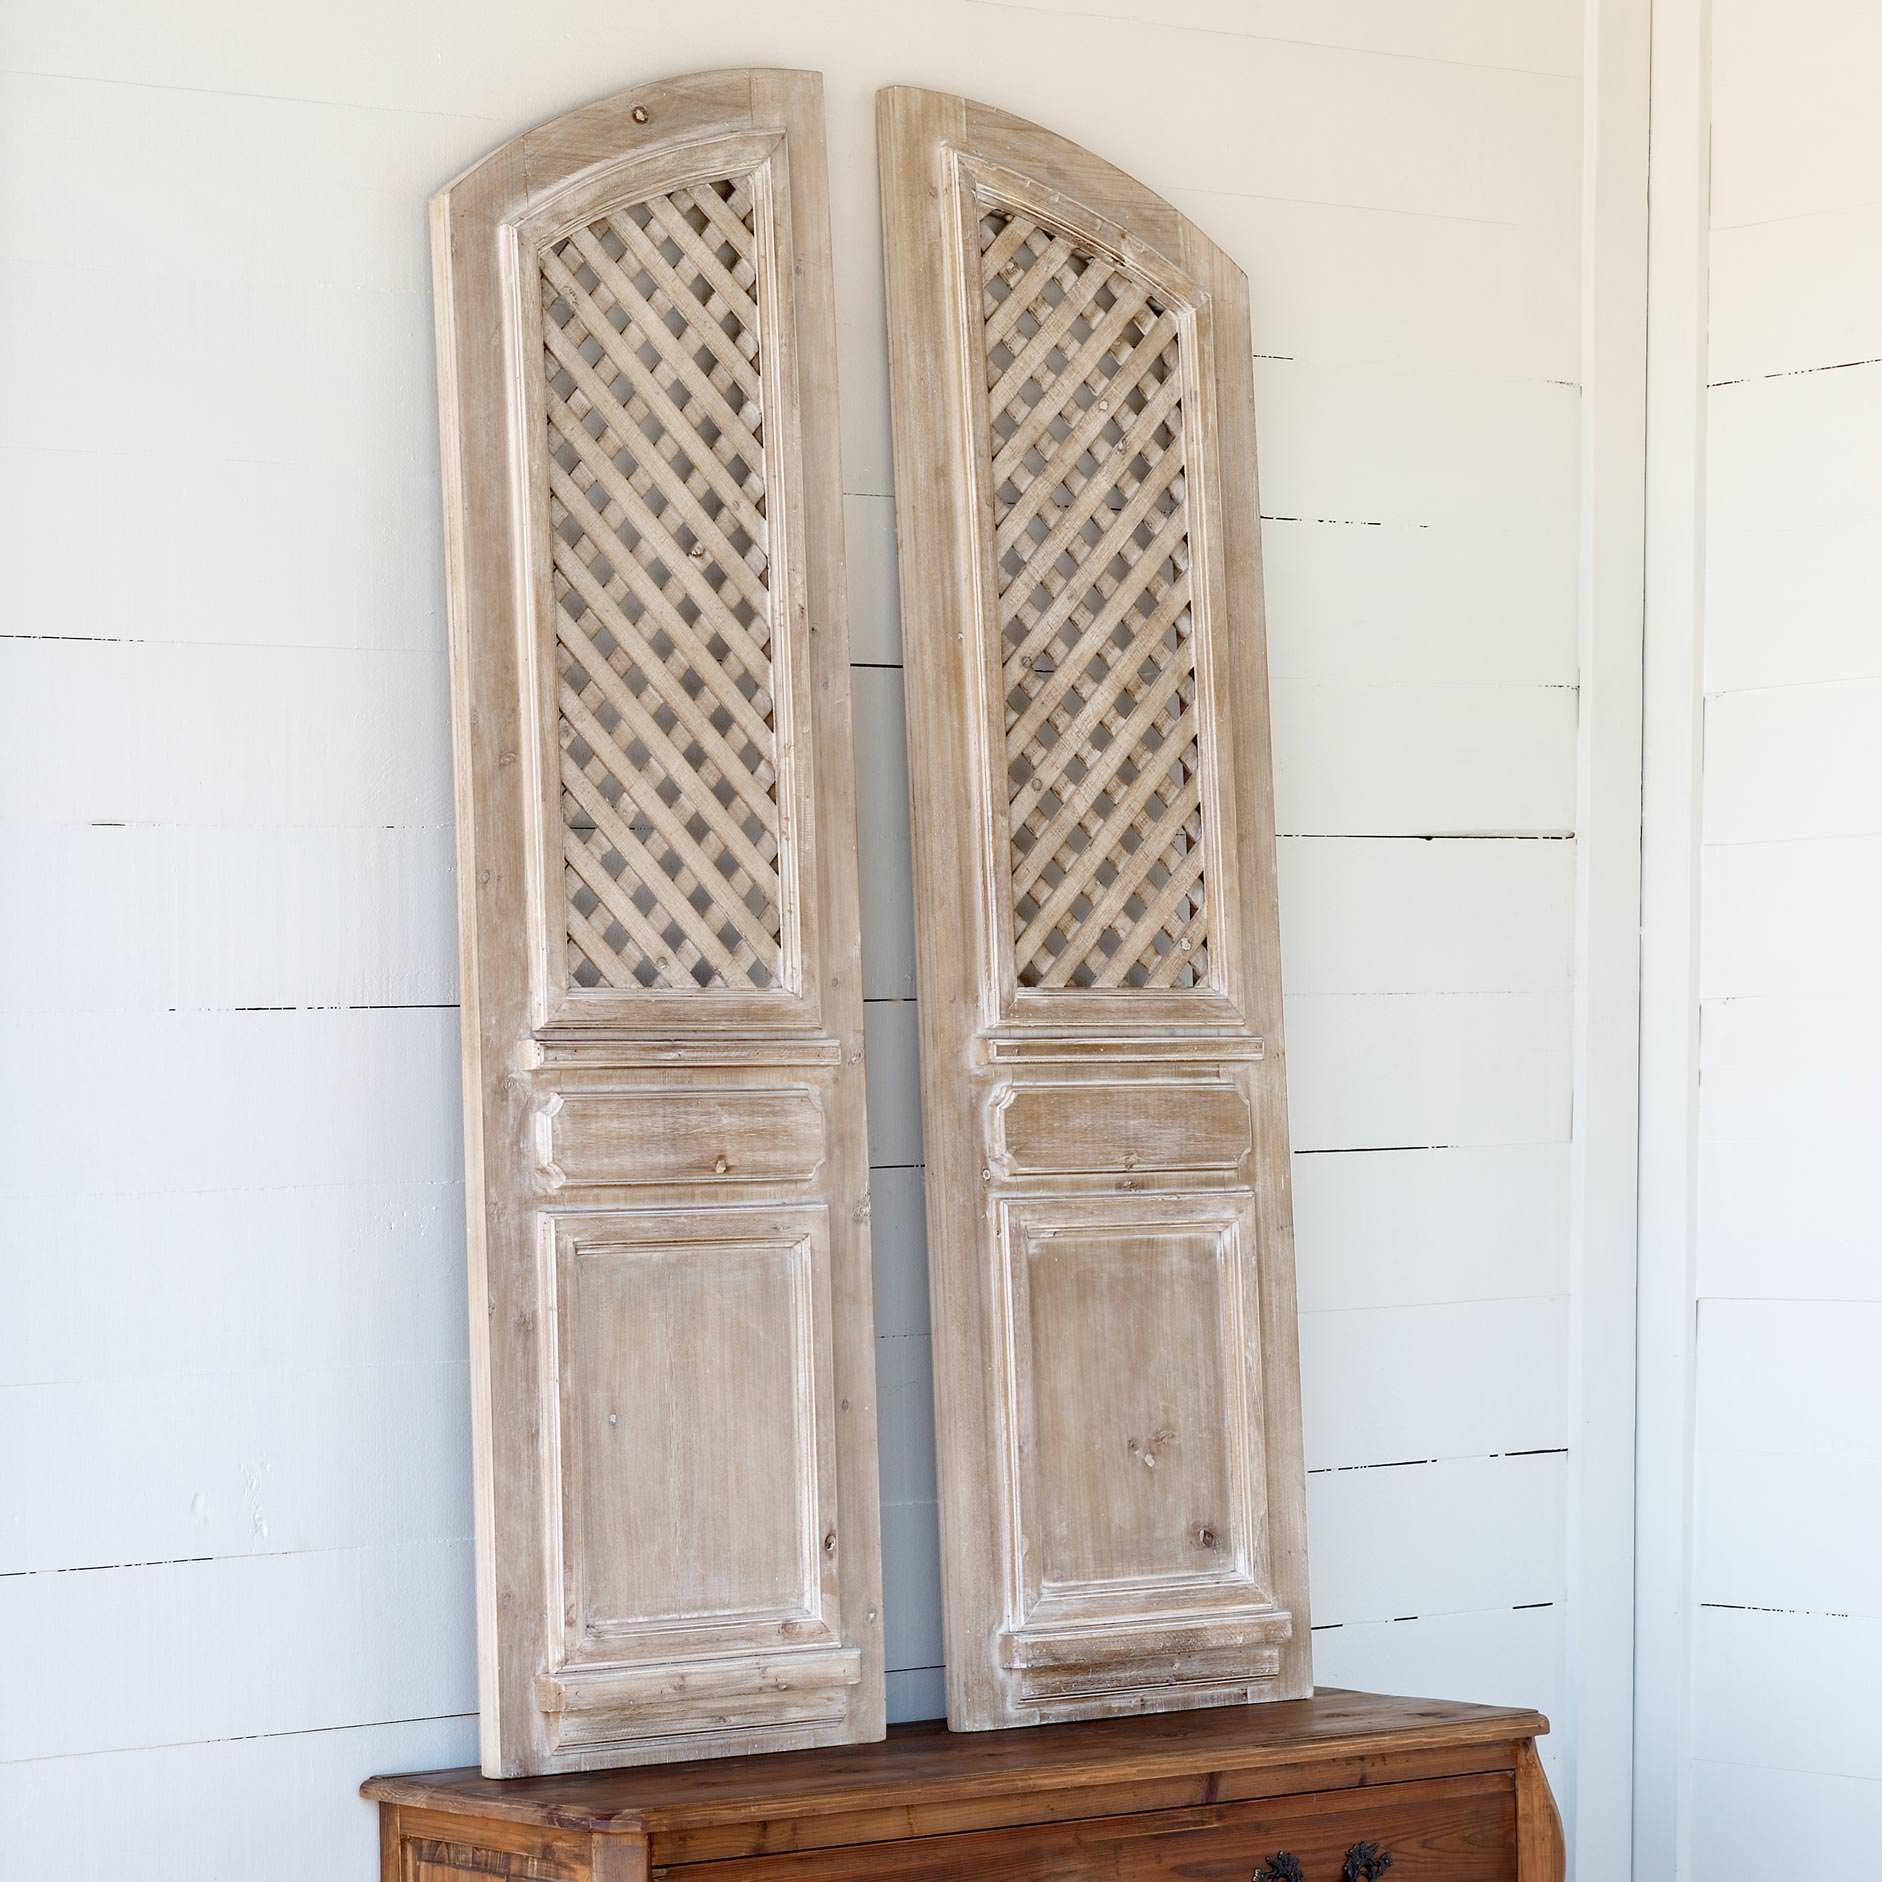 Arched Lattice Work Panels